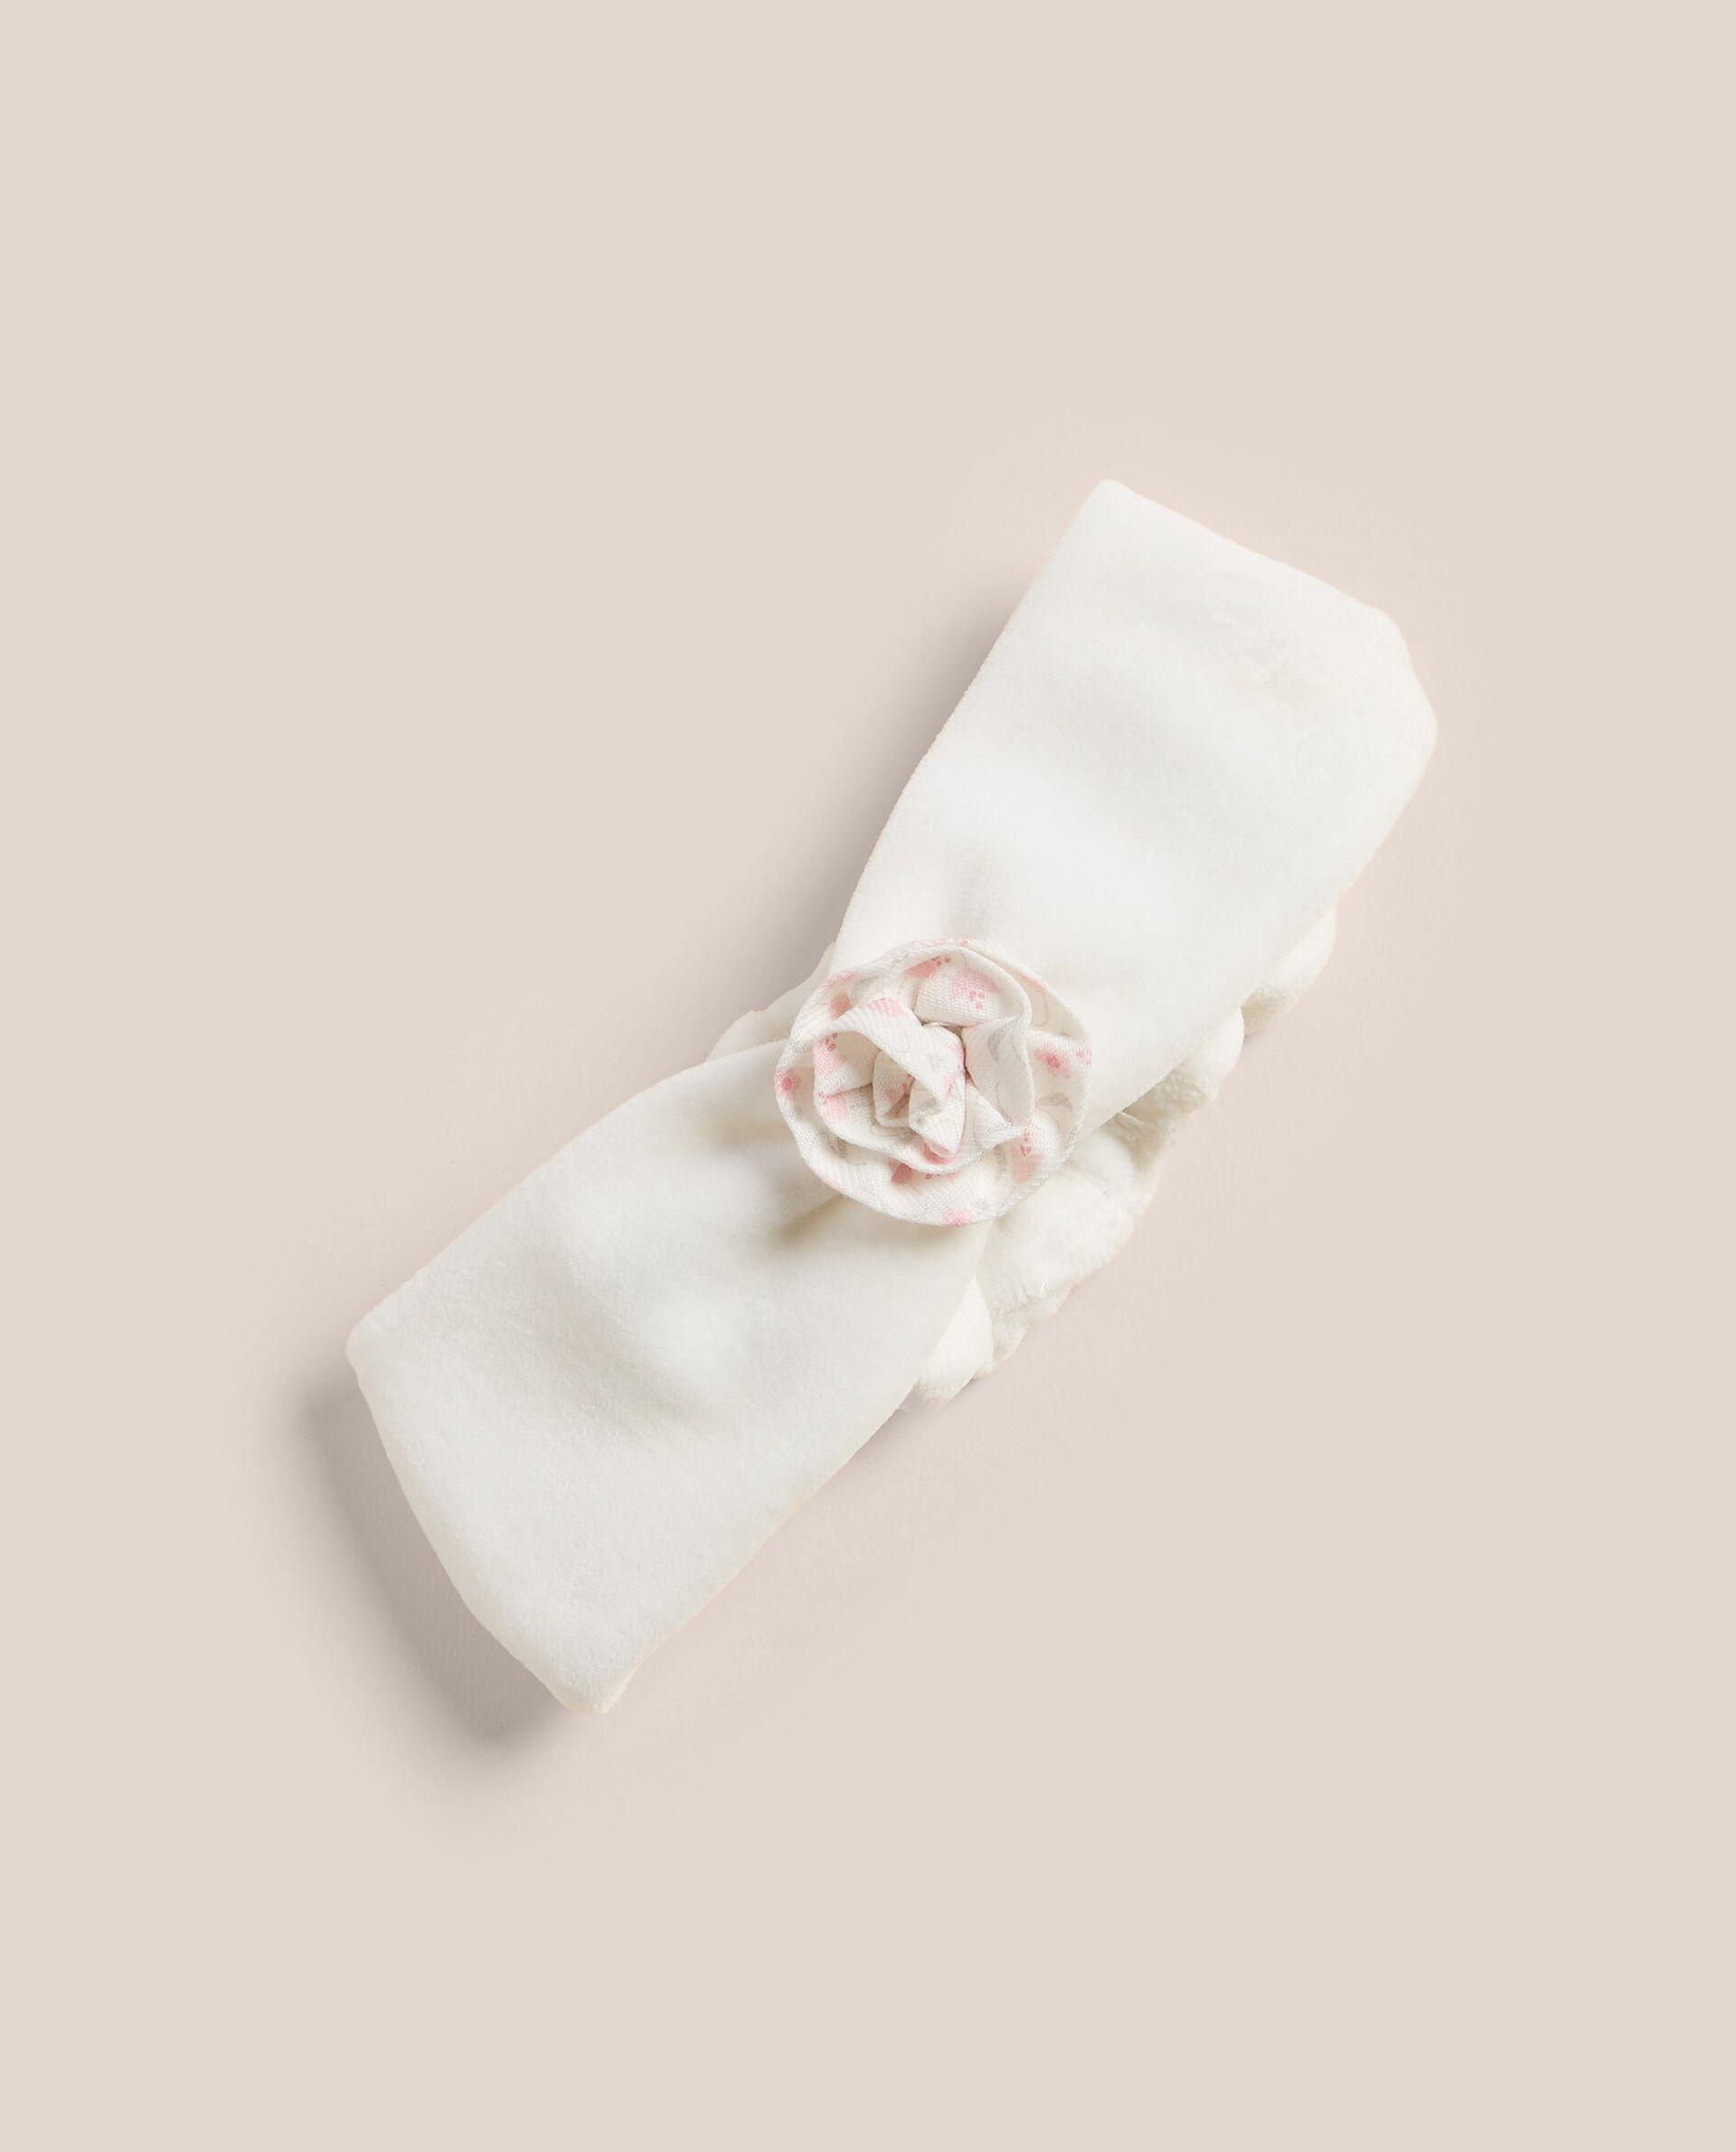 Fascetta di cotone stretch IANA Made in Italy